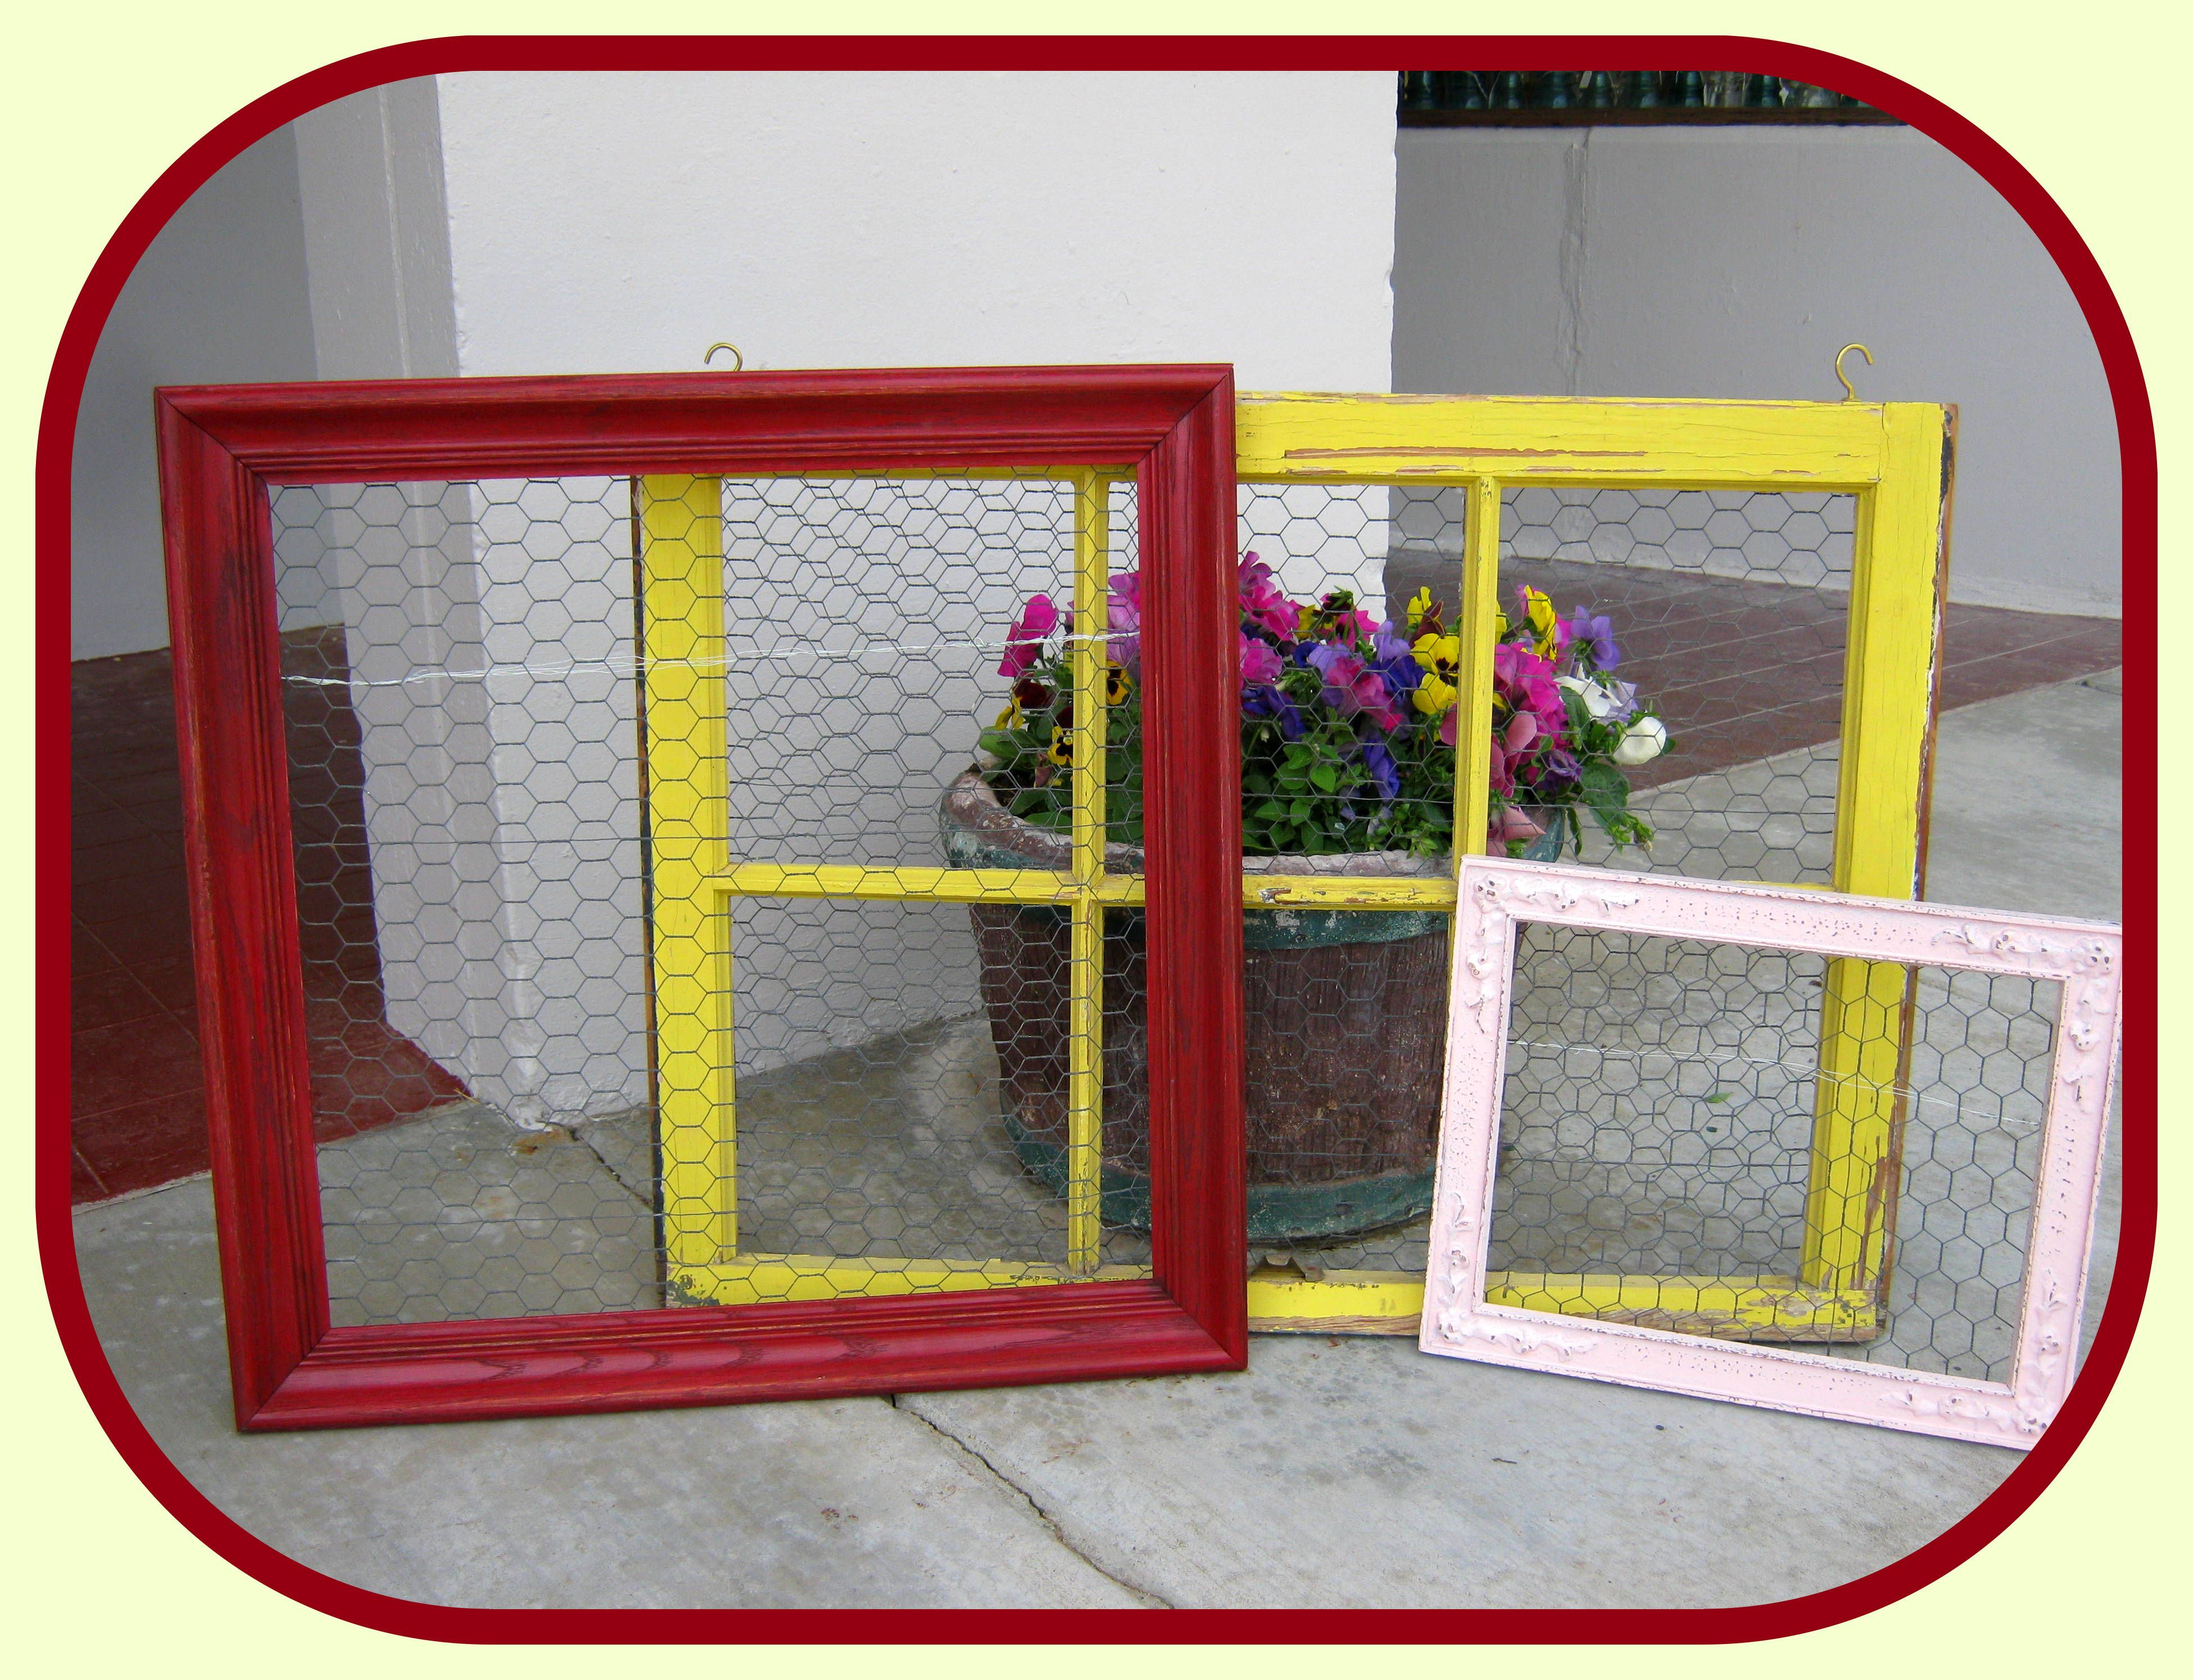 Vintage Salvaged Windows Frames With Chicken Wire To